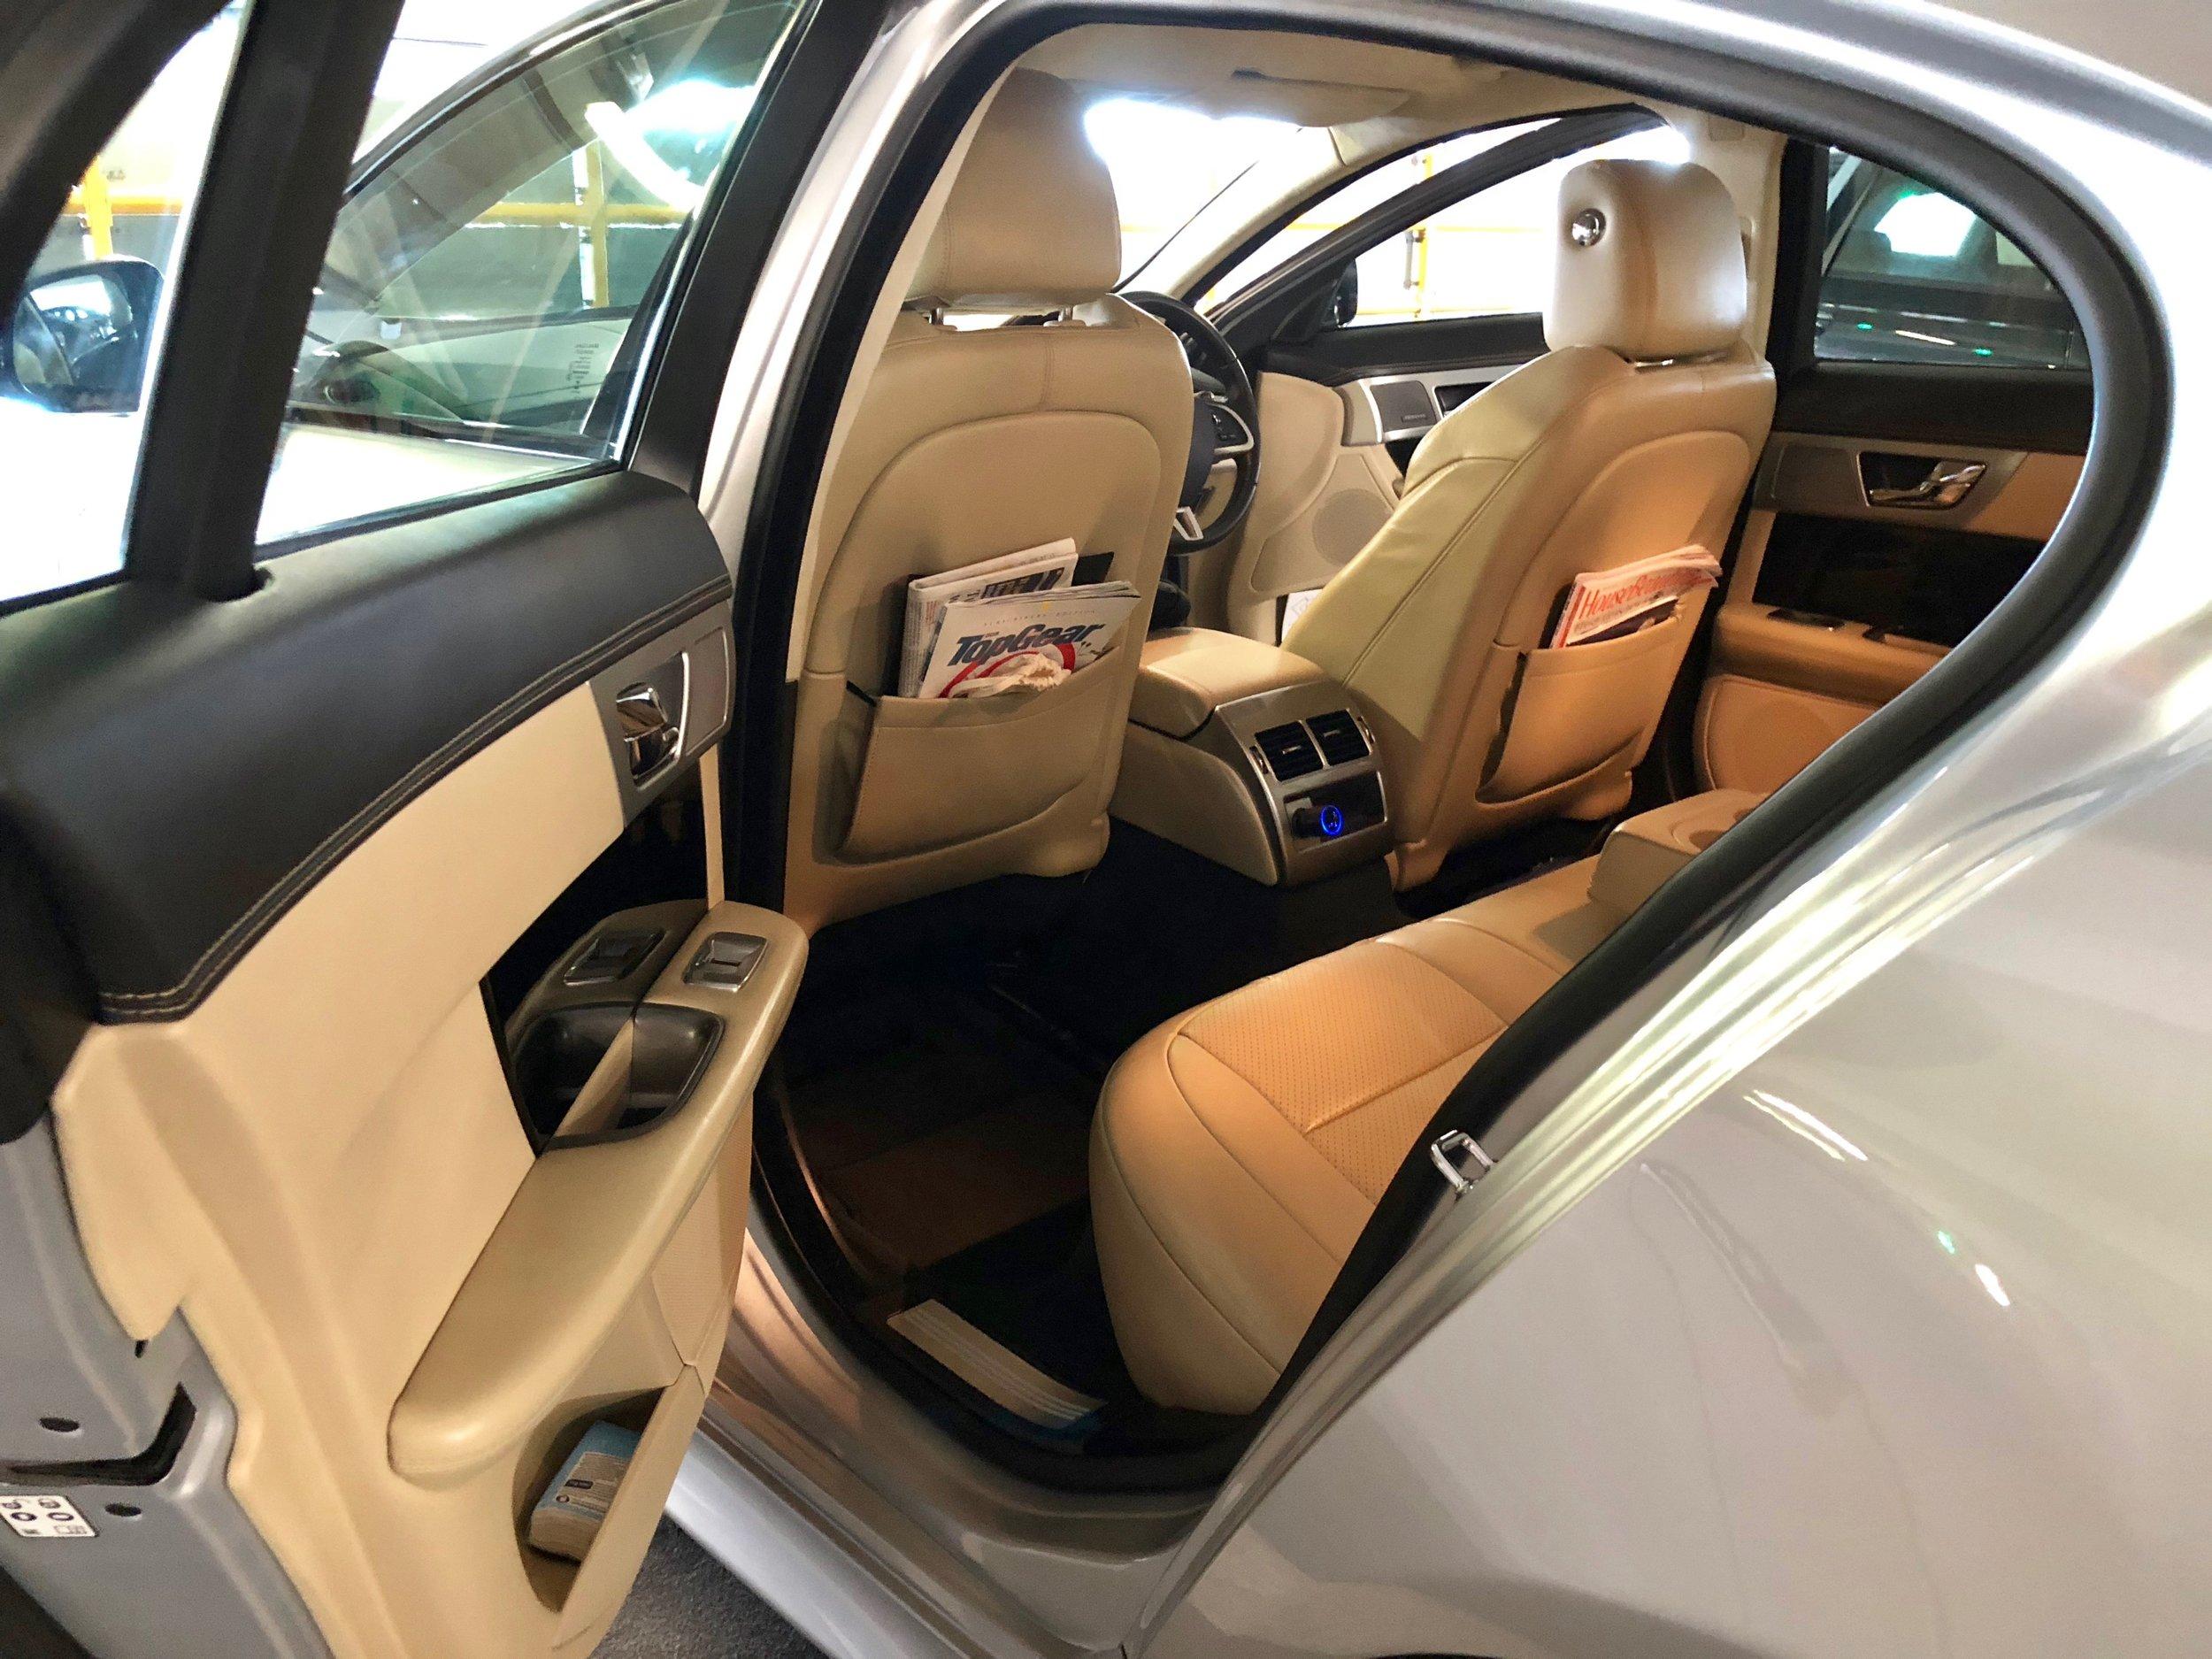 Jaguar XFS interior